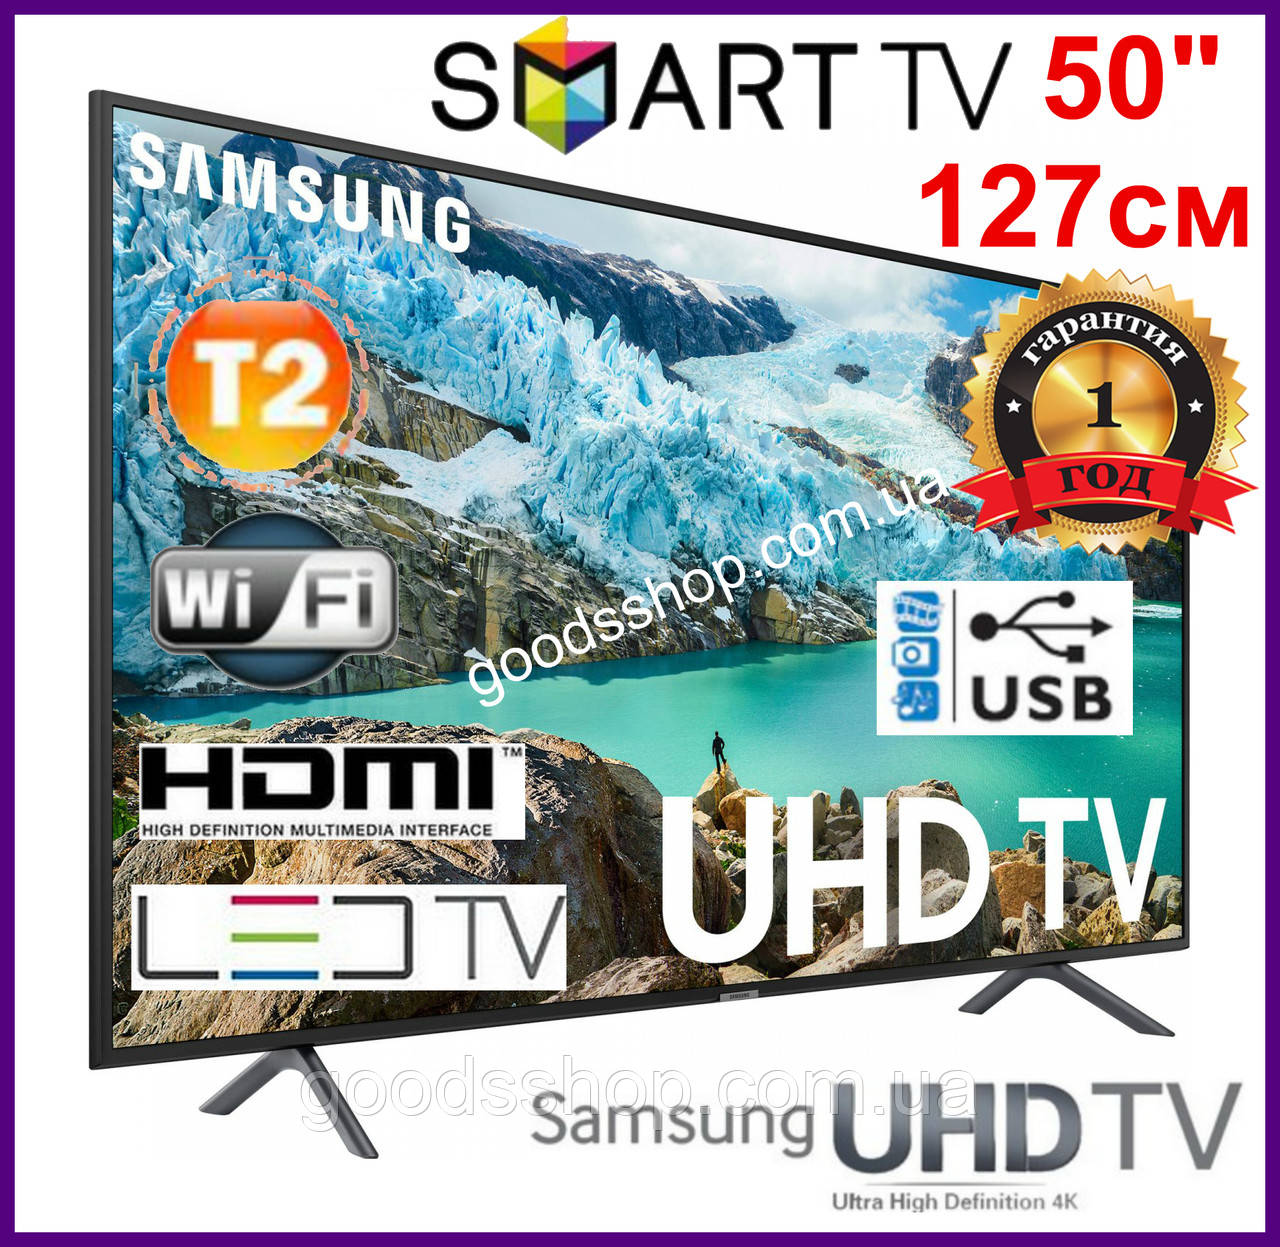 Телевизор Samsung Самсунг 50 дюймов (127см) 4K Ultra HD Smart TV UE50NU7100  Т2 WiFi LED Телевізор 2018 (A)